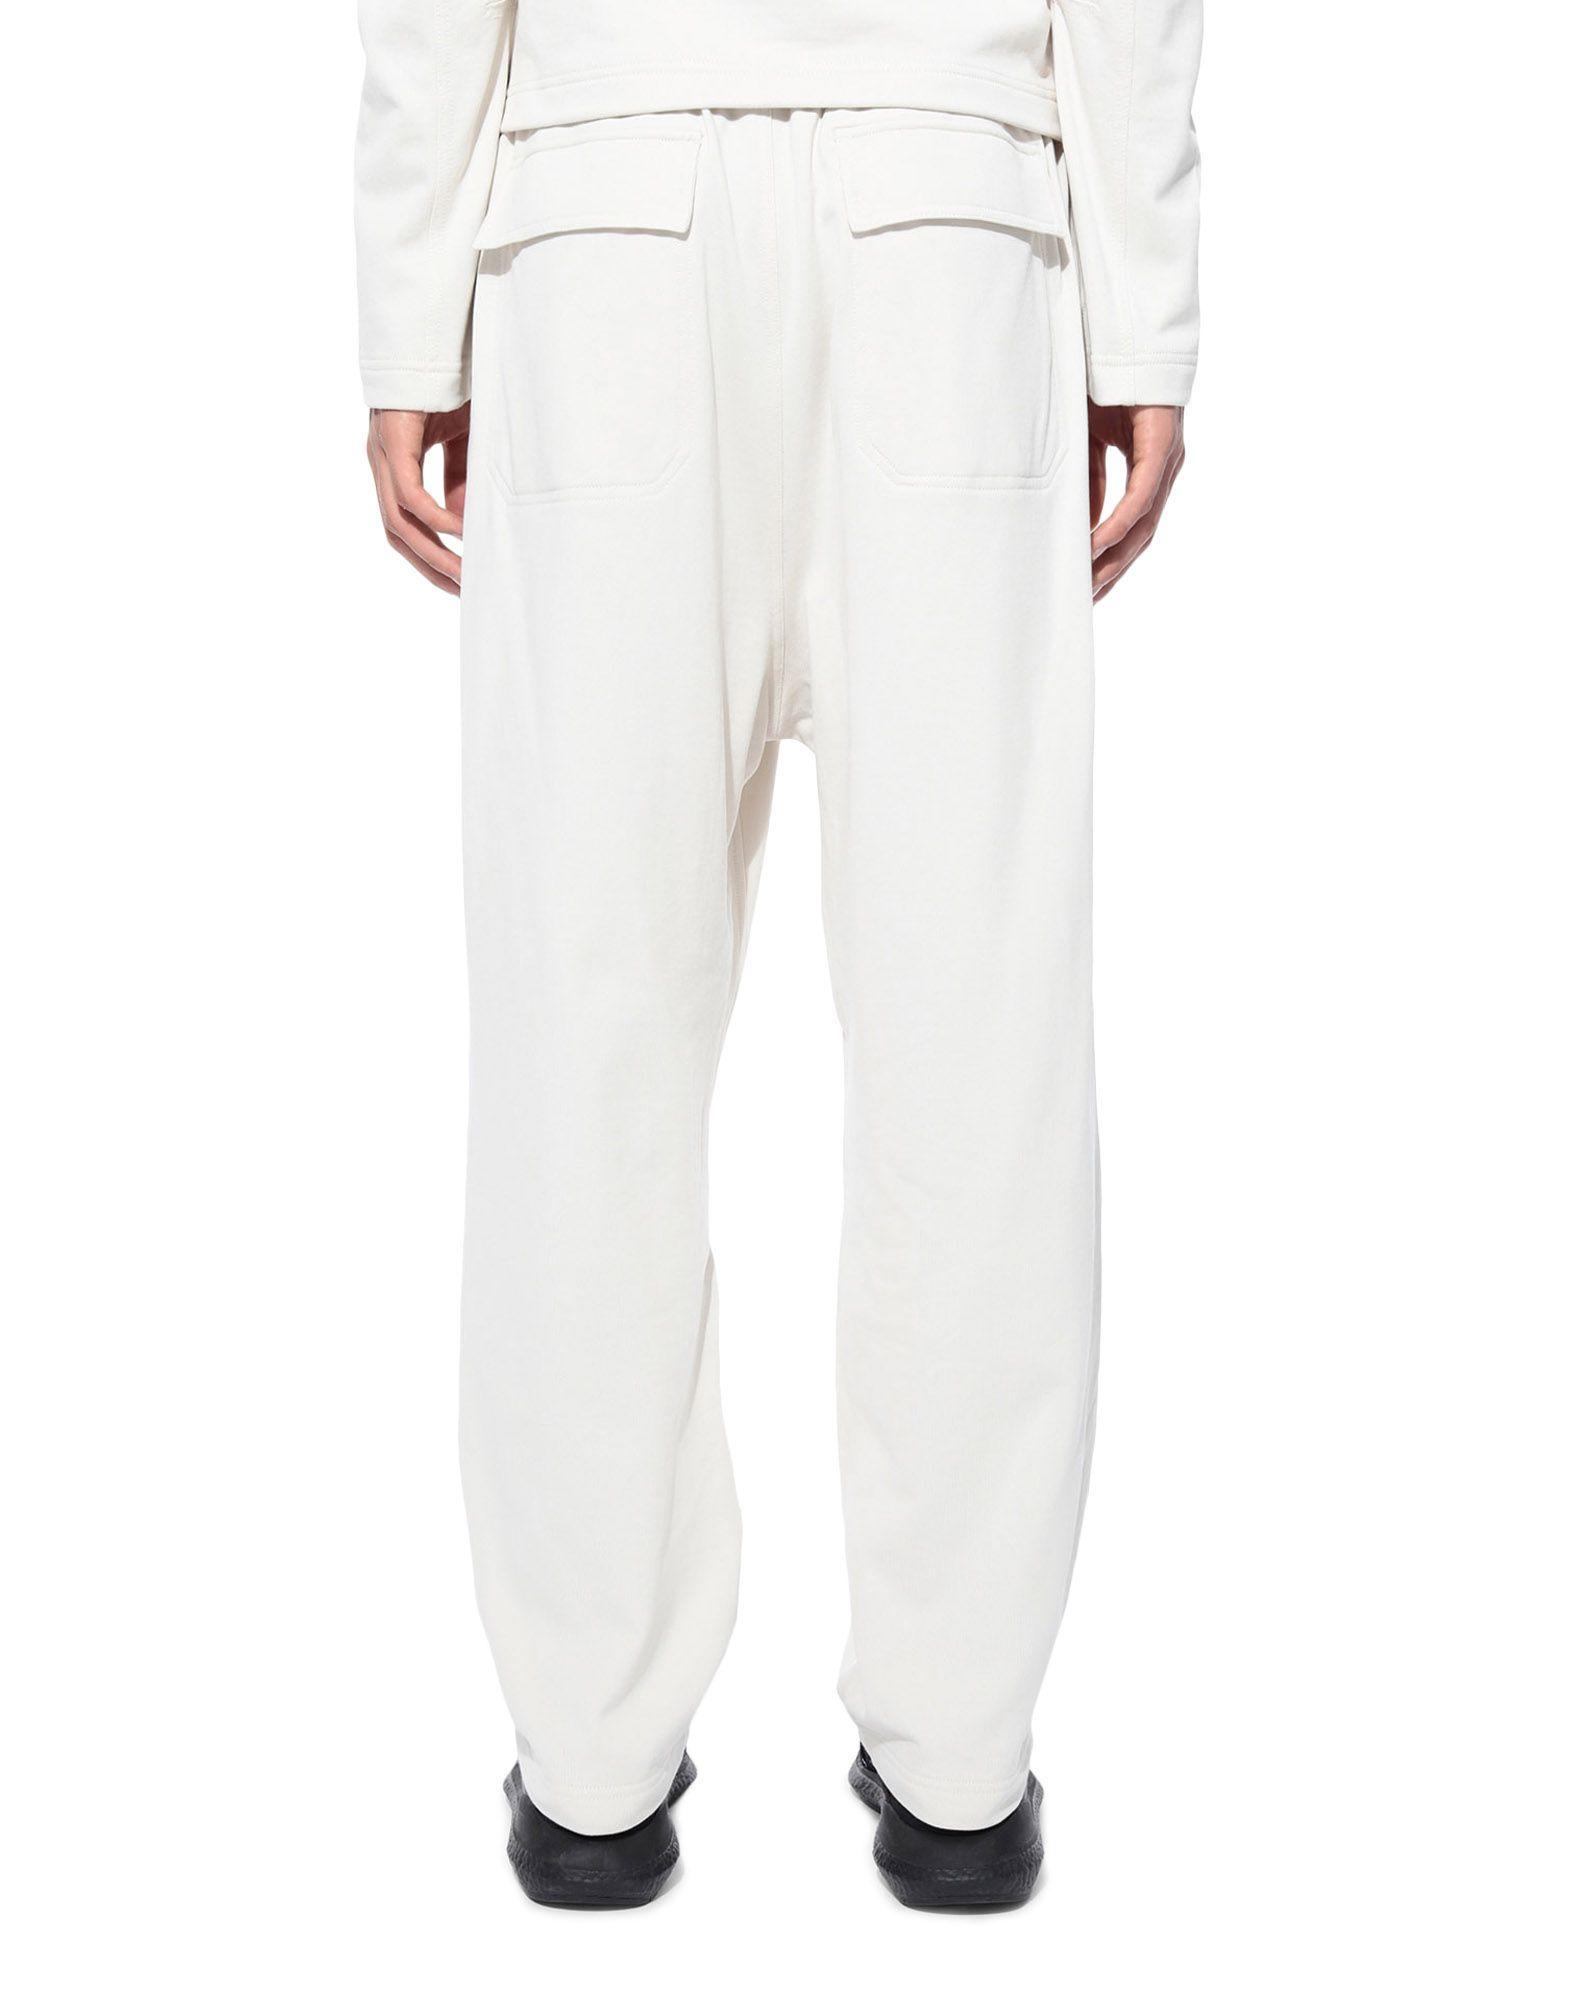 Y-3 Y-3 Sashiko Pants Sweatpants Man d